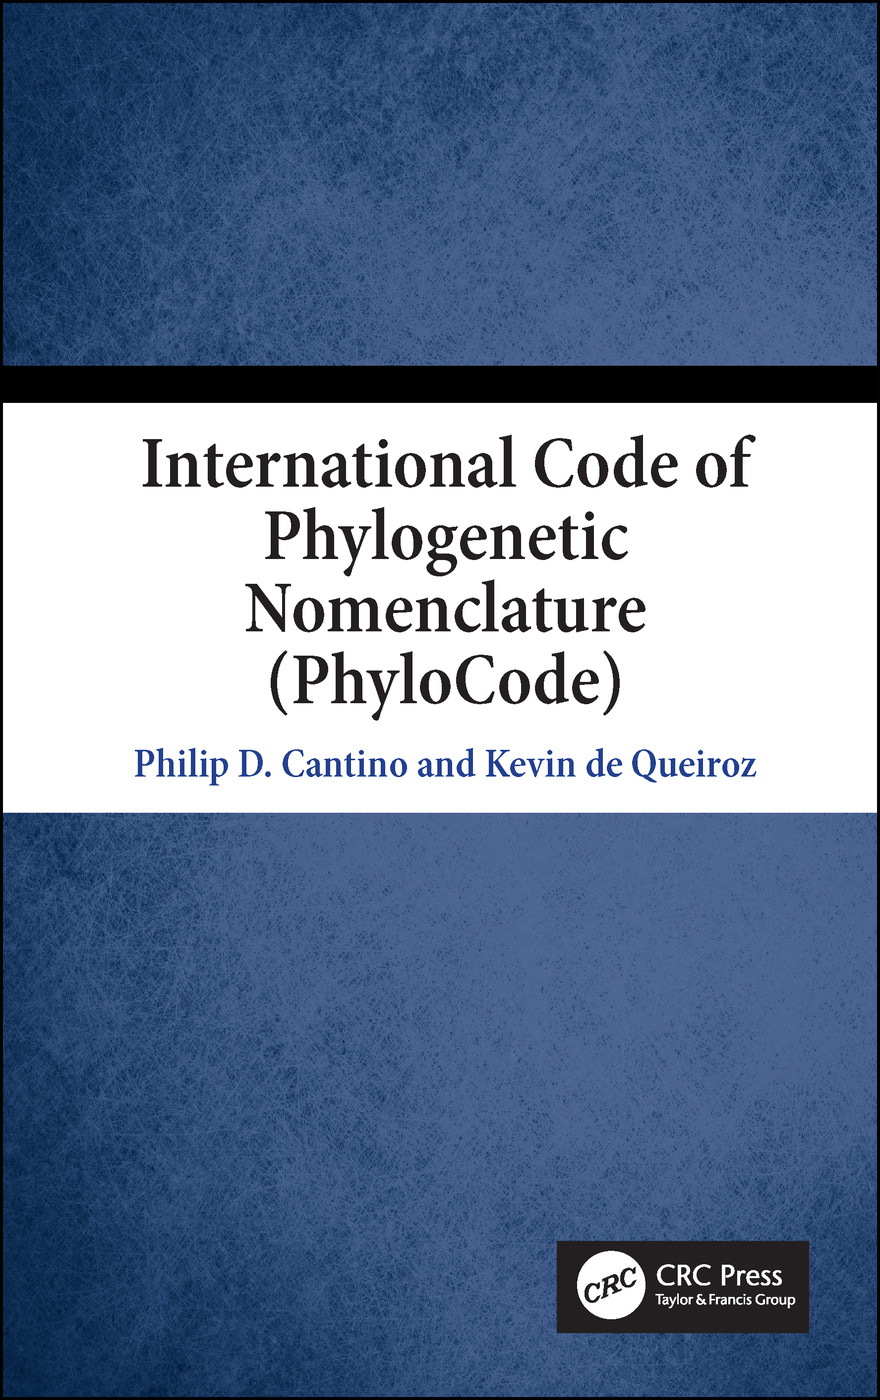 International Code of Phylogenetic Nomenclature (PhyloCode)